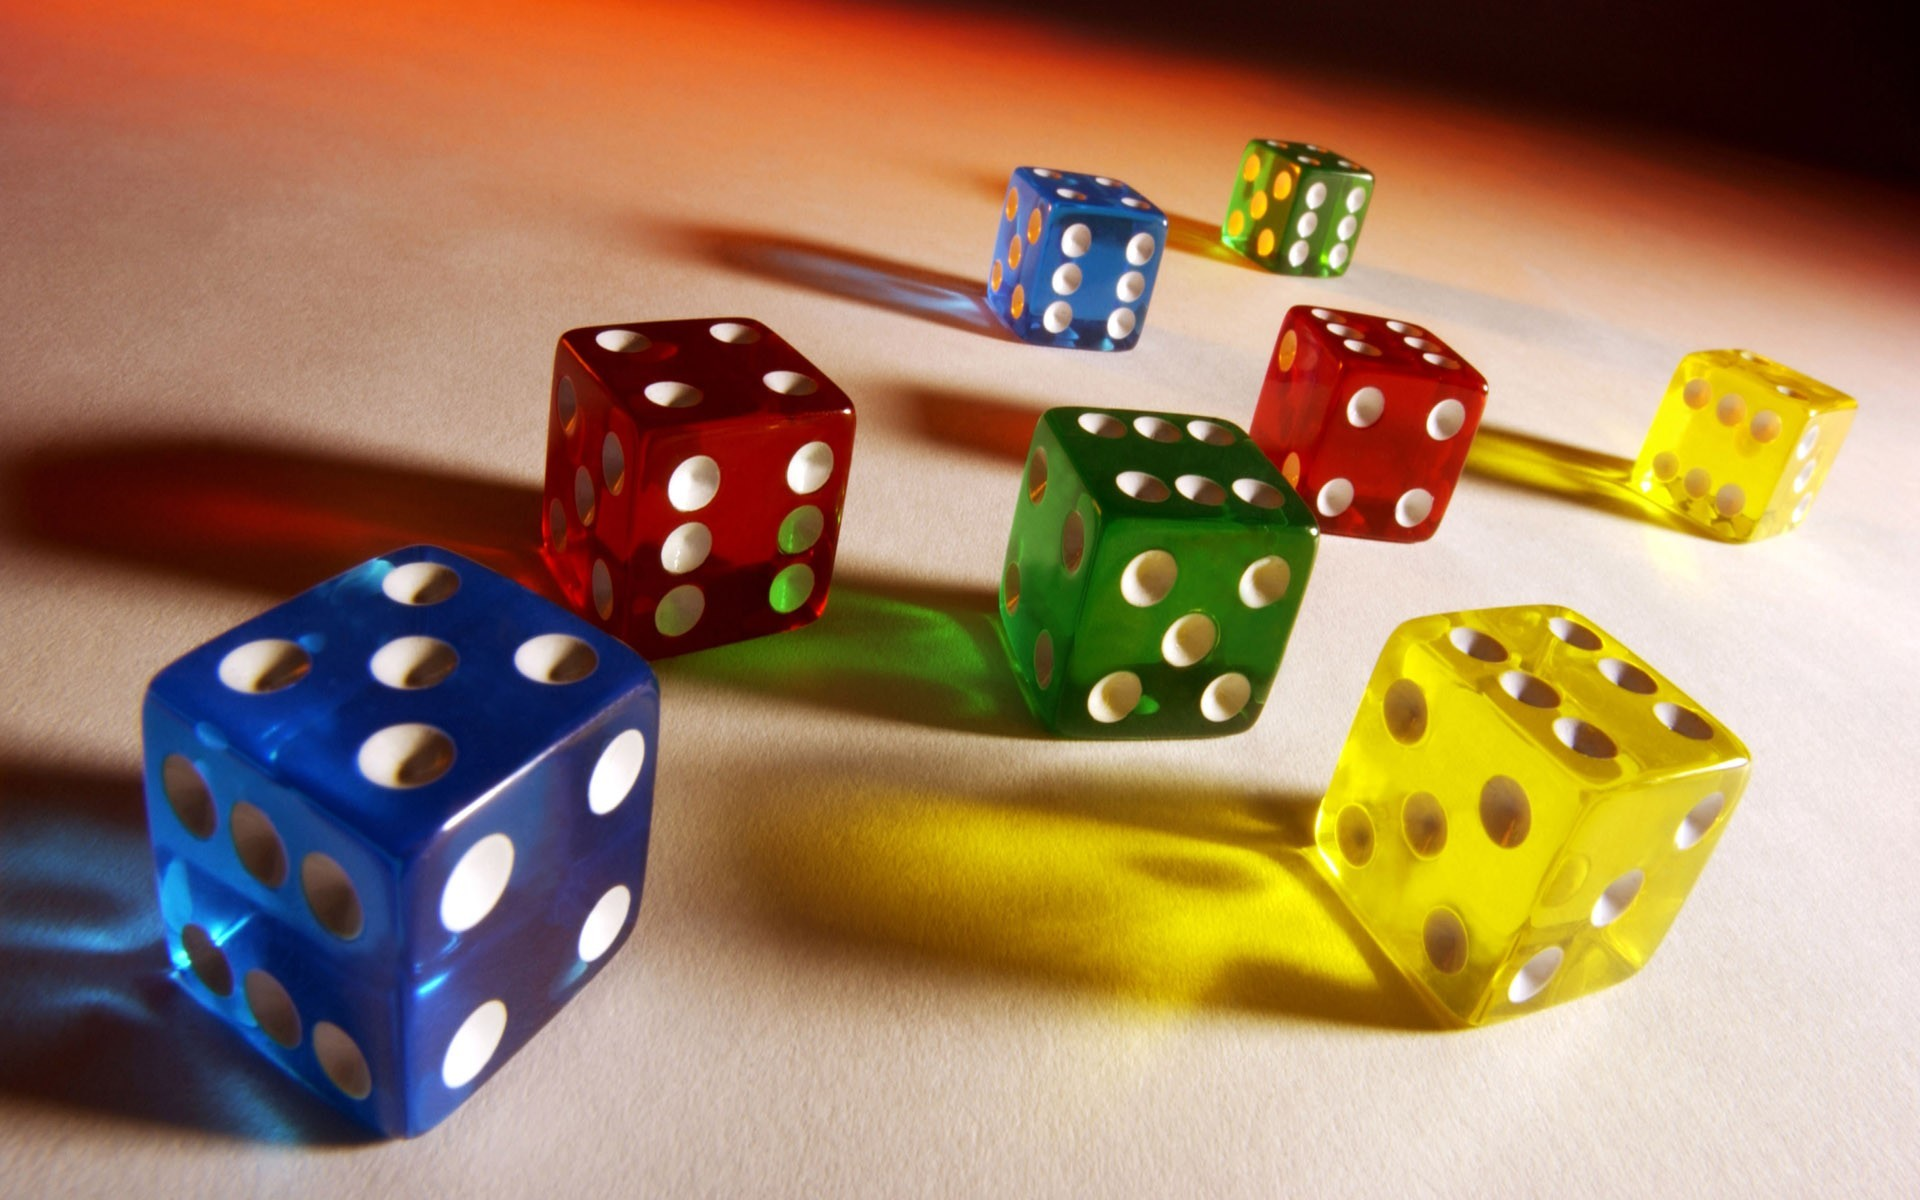 Parent Directory · 3d-colorful-dice-wallpaper-9238-9574-hd-wallpapers.jpg  …